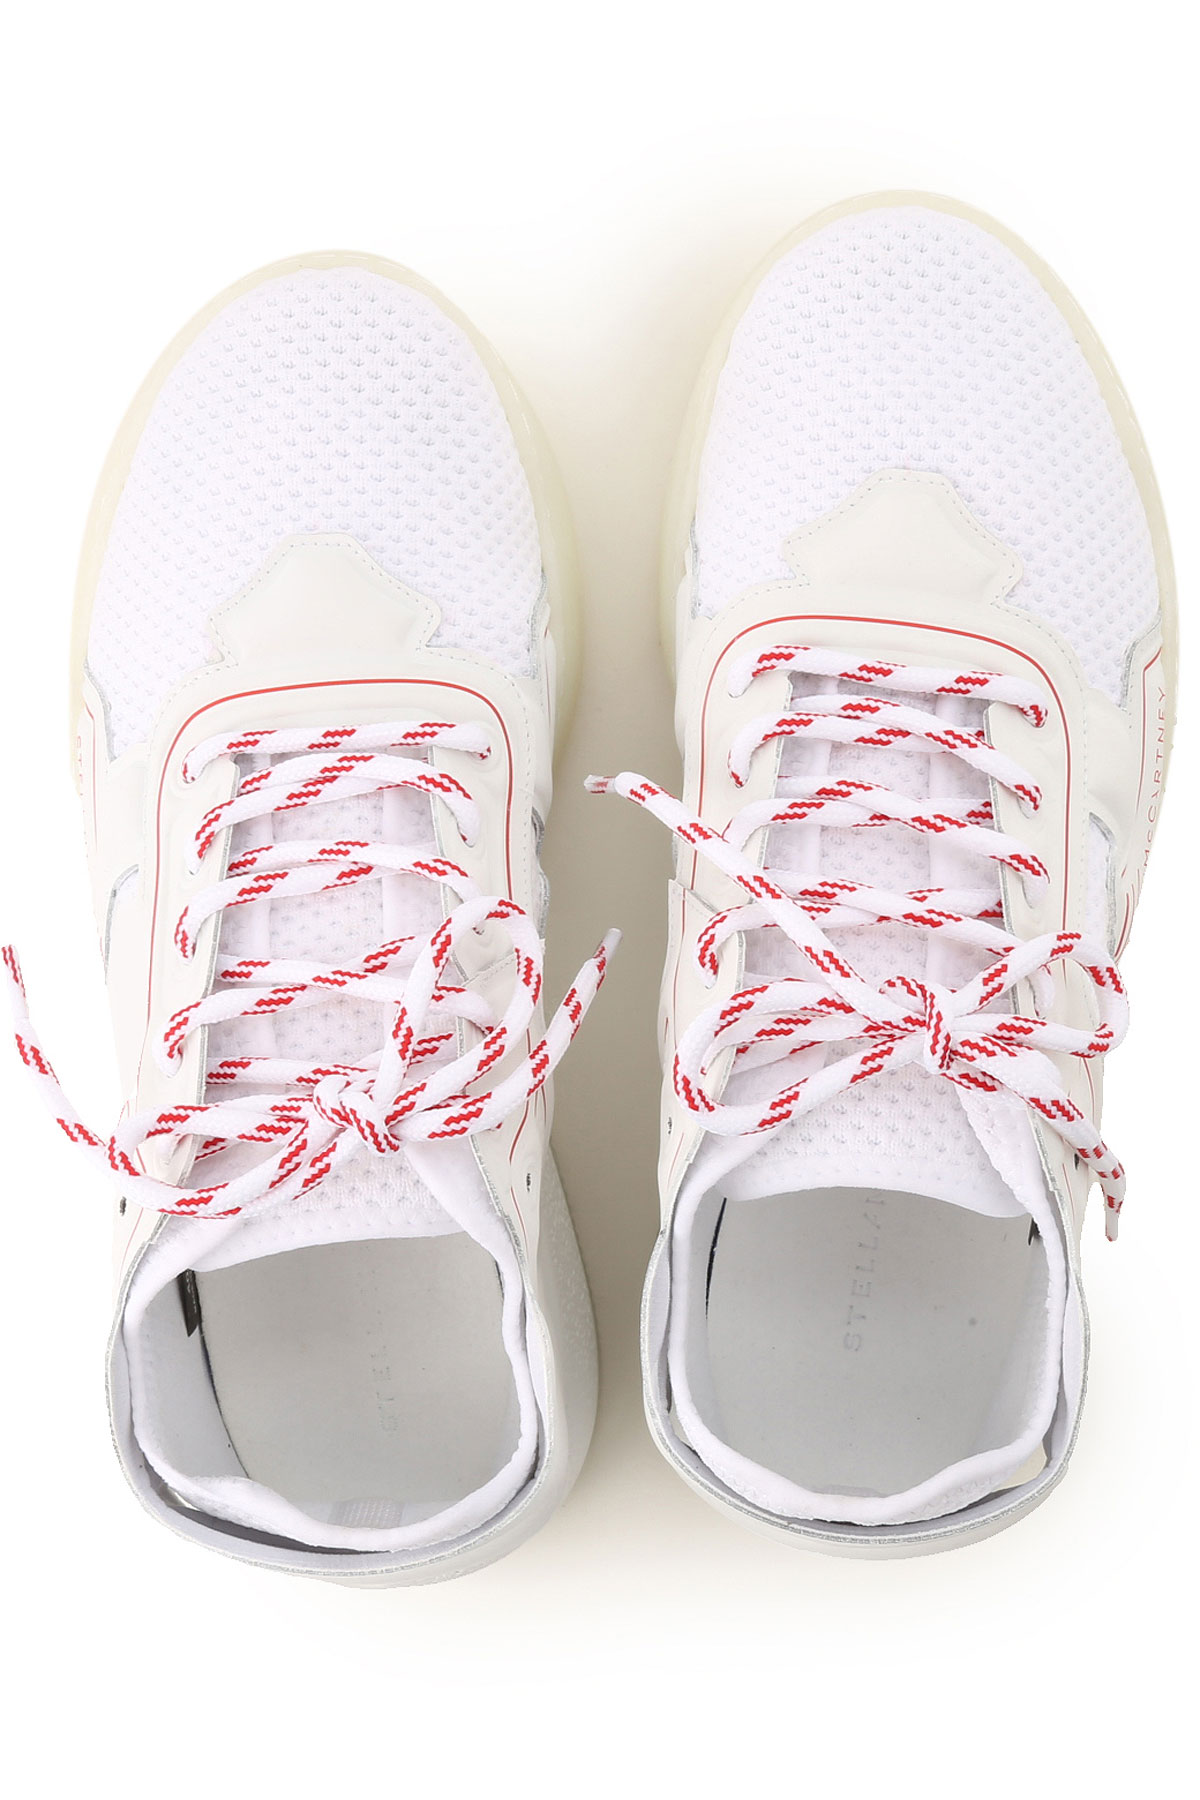 Zapatos Blanco Stella 2019 Primavera Para nbsp; verano Mujer Mccartney afH5fqw6